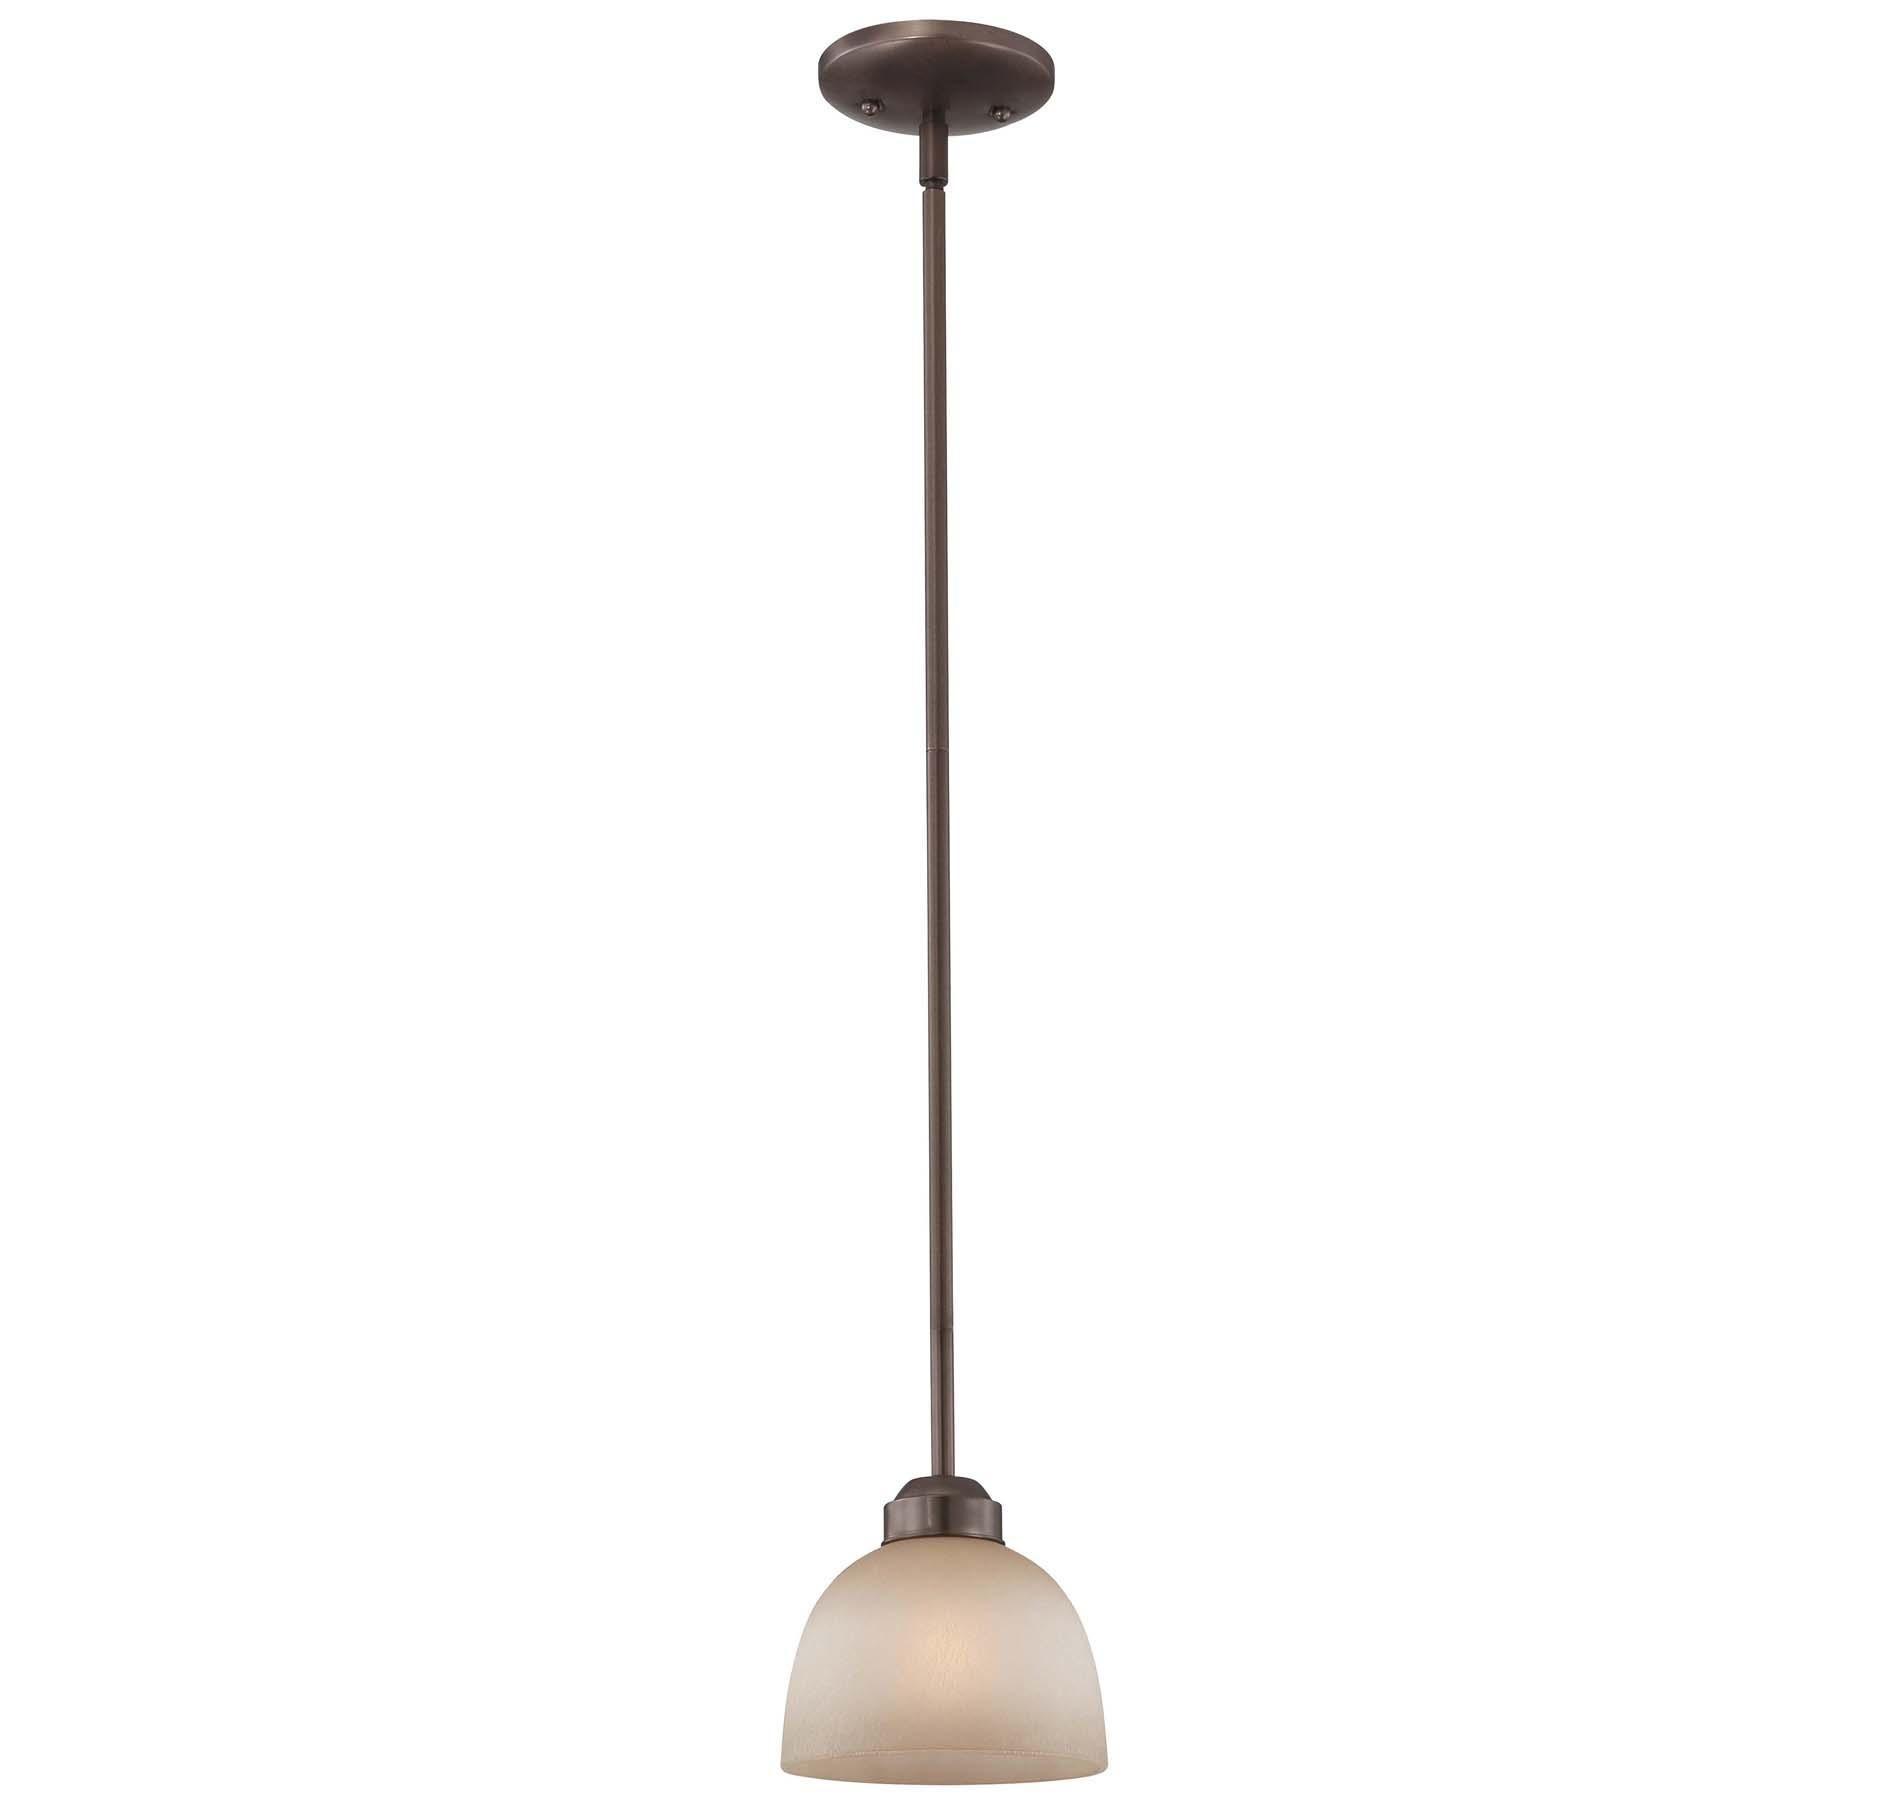 Minka Lavery 1421-281 Paradox Mini Pendant in Bronze in Ceiling Lights, Pendants, Mini Pendants: LeeLighting.com